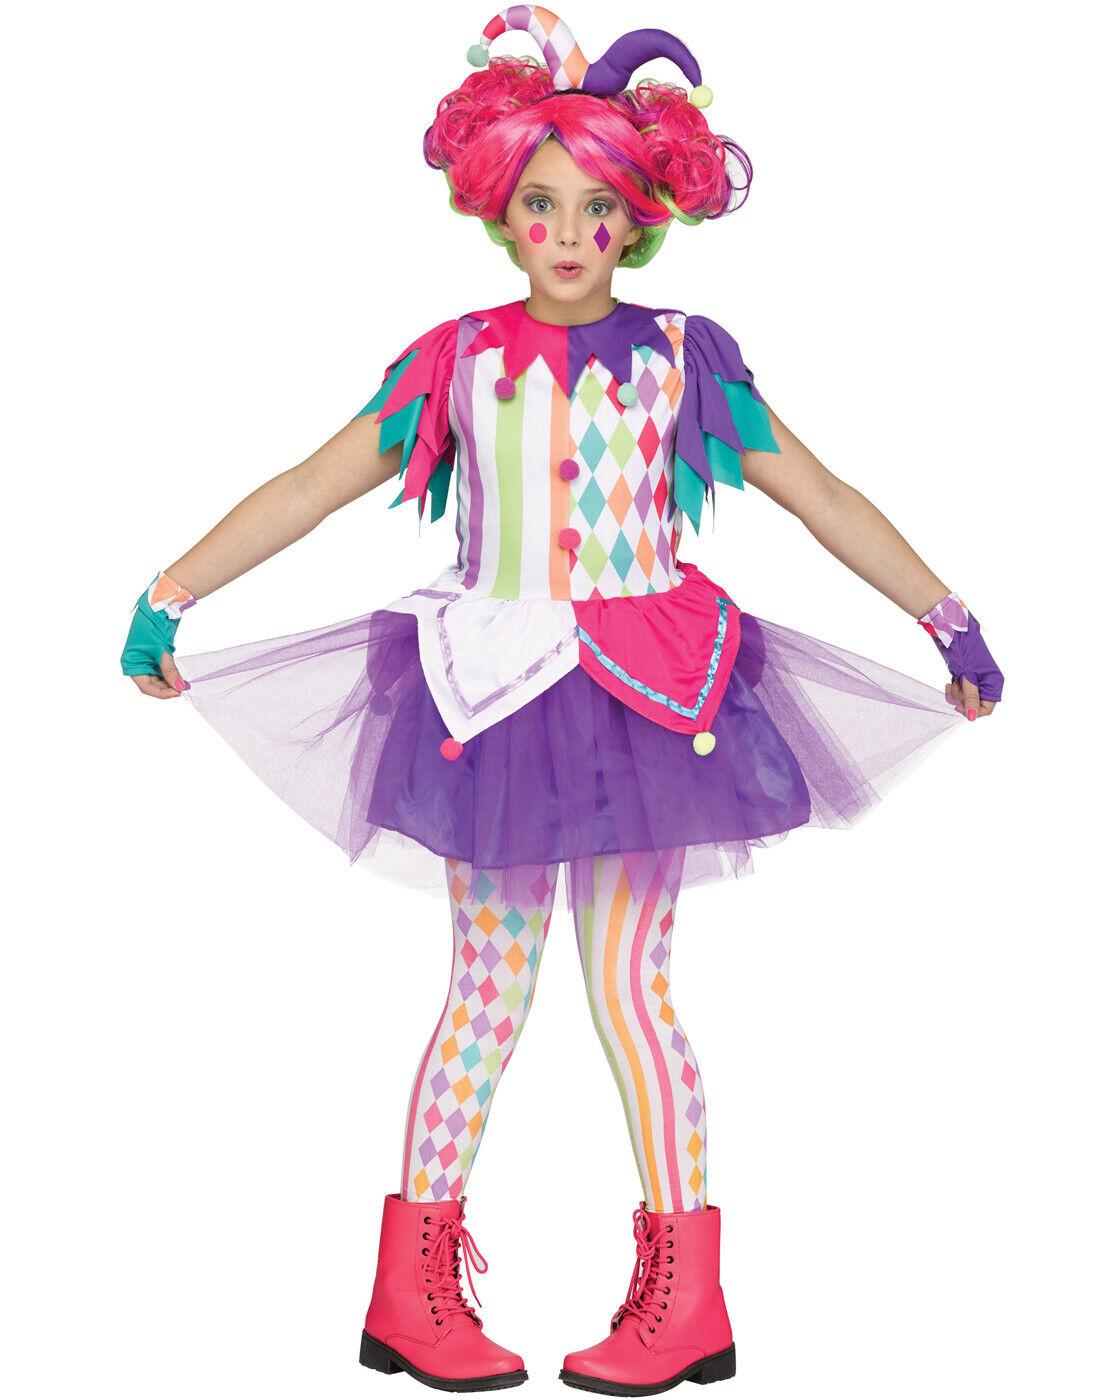 CA877 Sadistic Clown Jester Harlequin Circus Halloween Evil Pennywise IT Costume